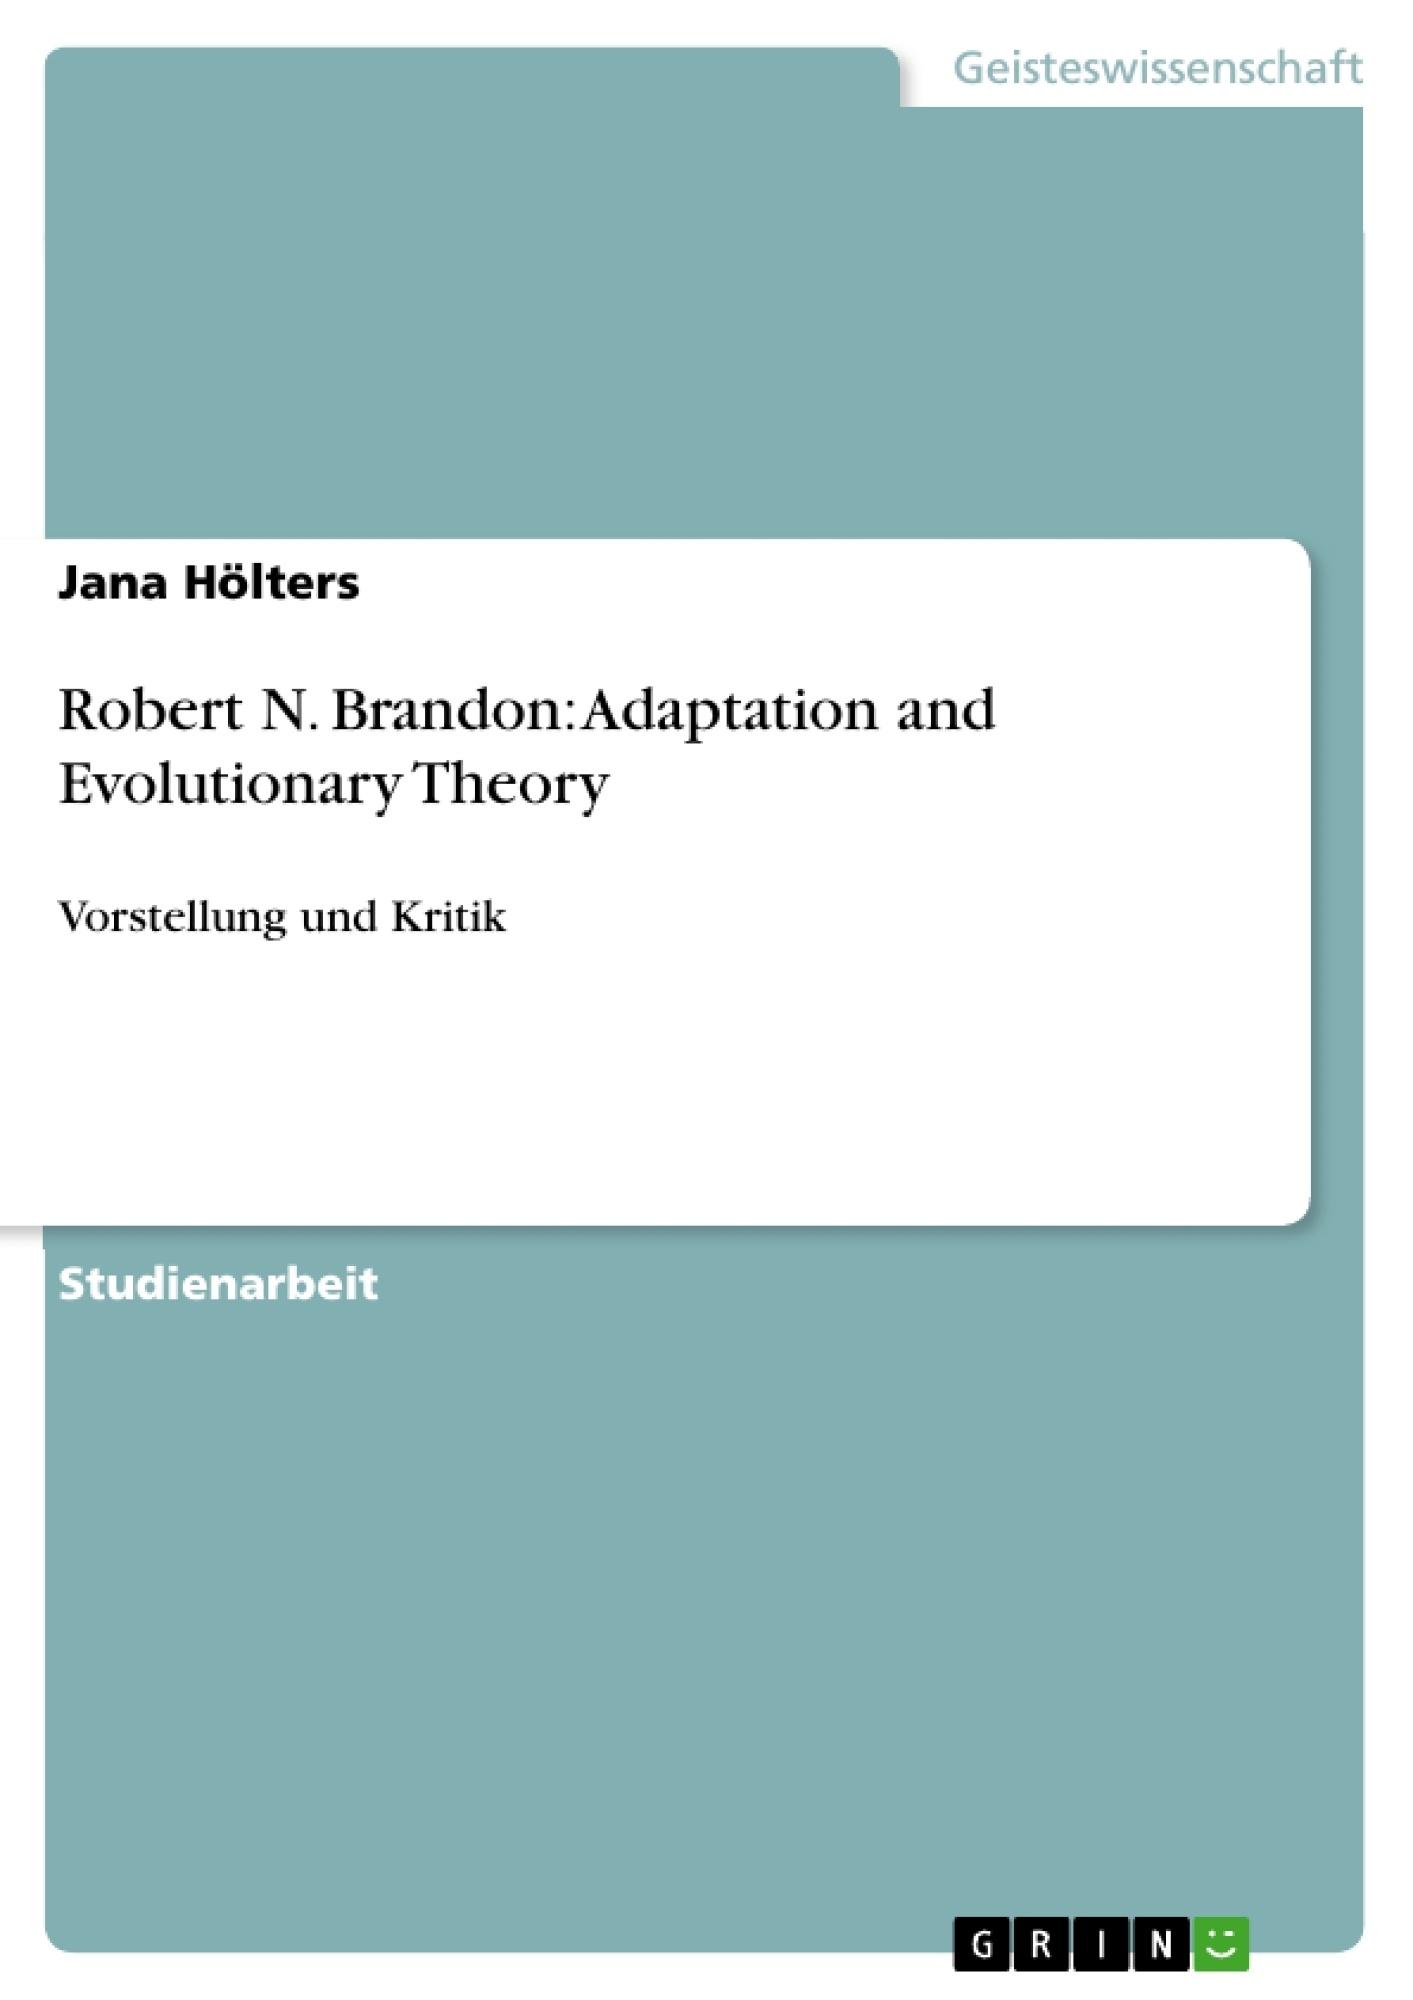 Titel: Robert N. Brandon: Adaptation and Evolutionary Theory